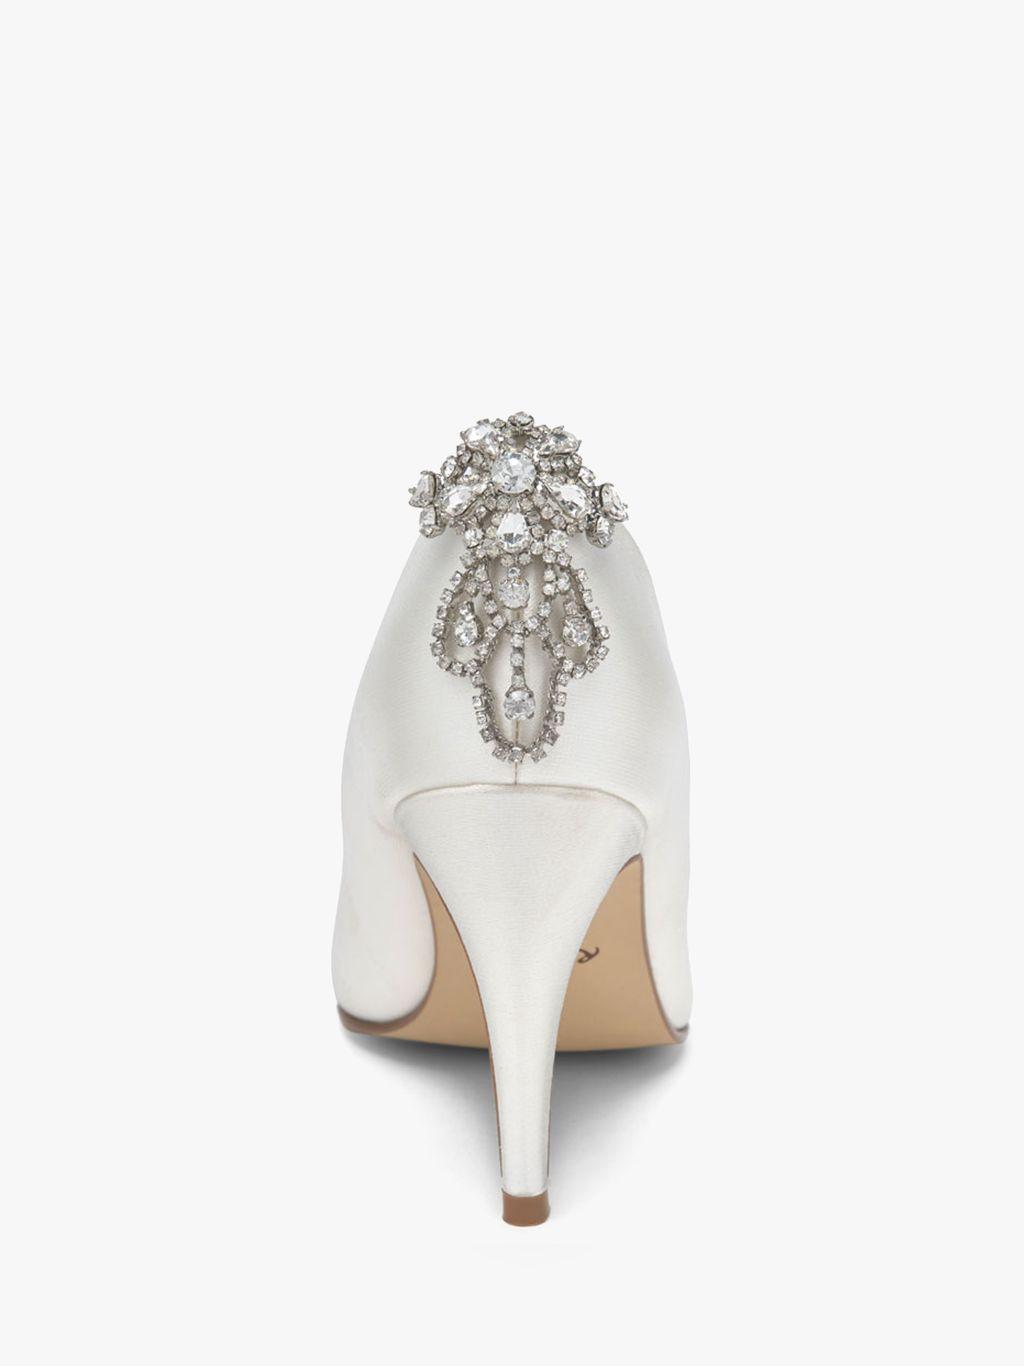 Rainbow Club Rainbow Club Electra Diamante Shoe Clips, Silver